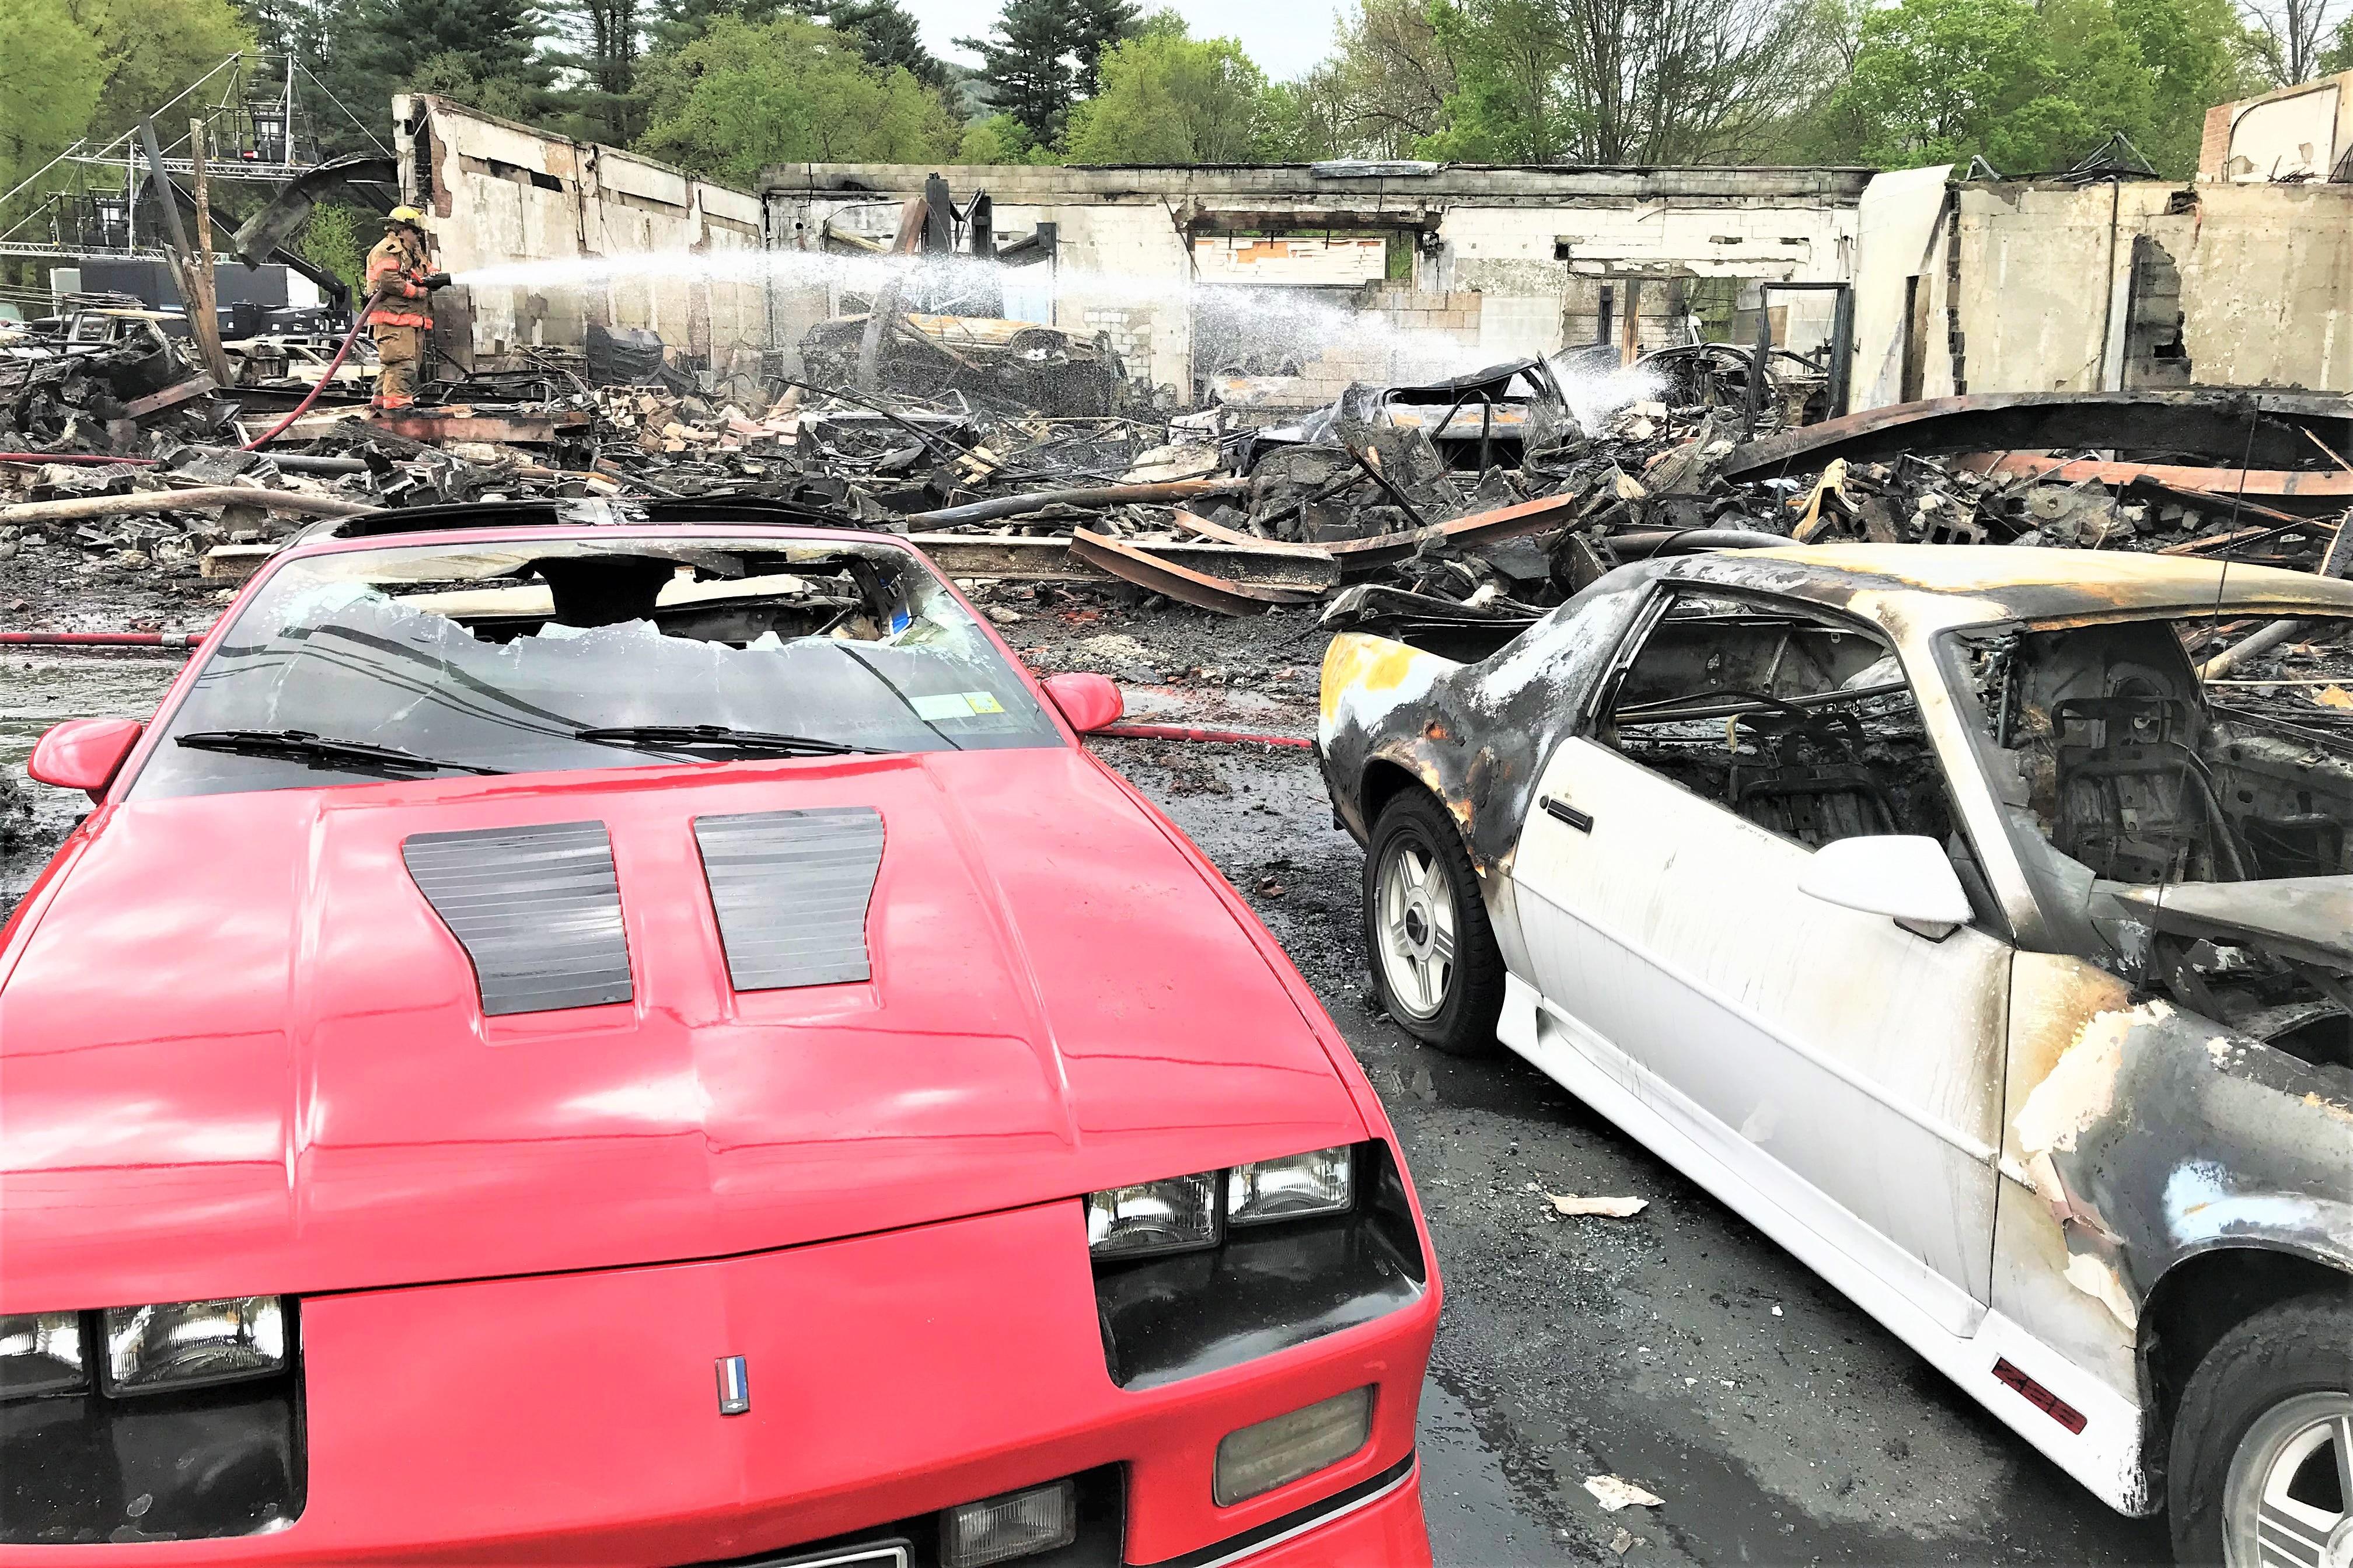 Honda Dealership Las Vegas >> Pristine Vintage Chevrolets Incinerated in Fire on HBO ...